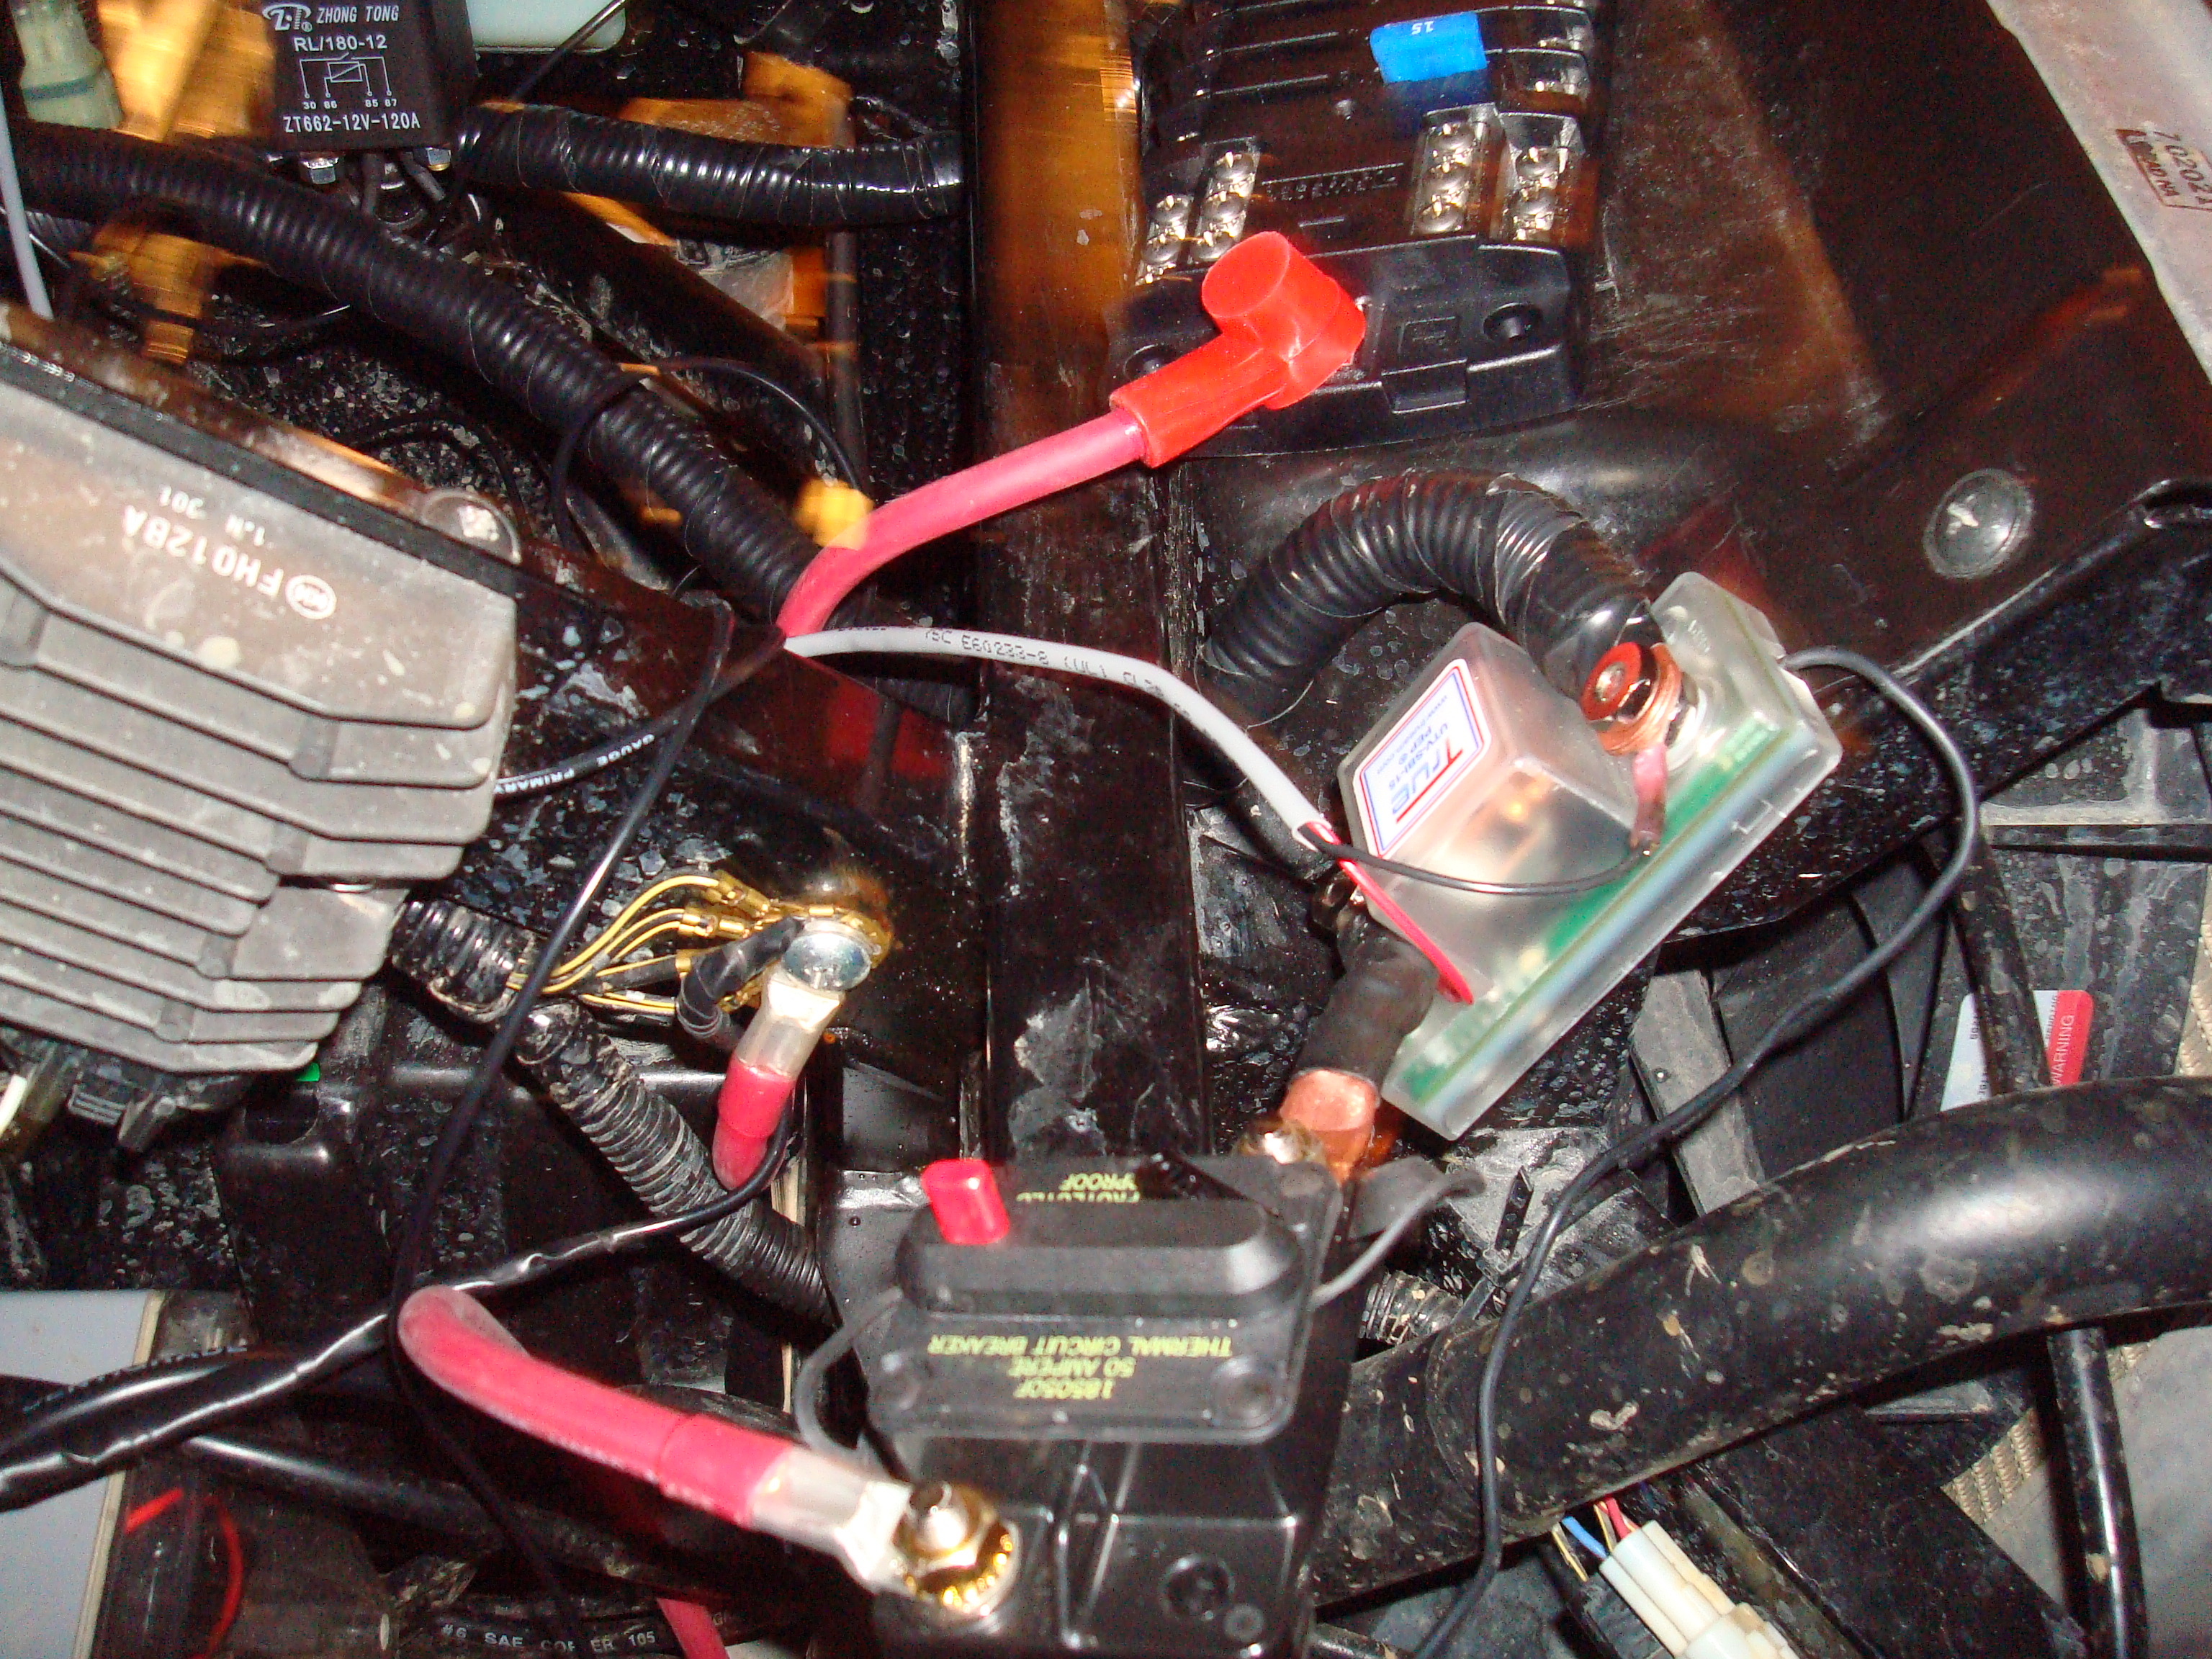 teryx 4 2012 battery 2, fuse box | Kawasaki Teryx ForumKawasaki Teryx Forum